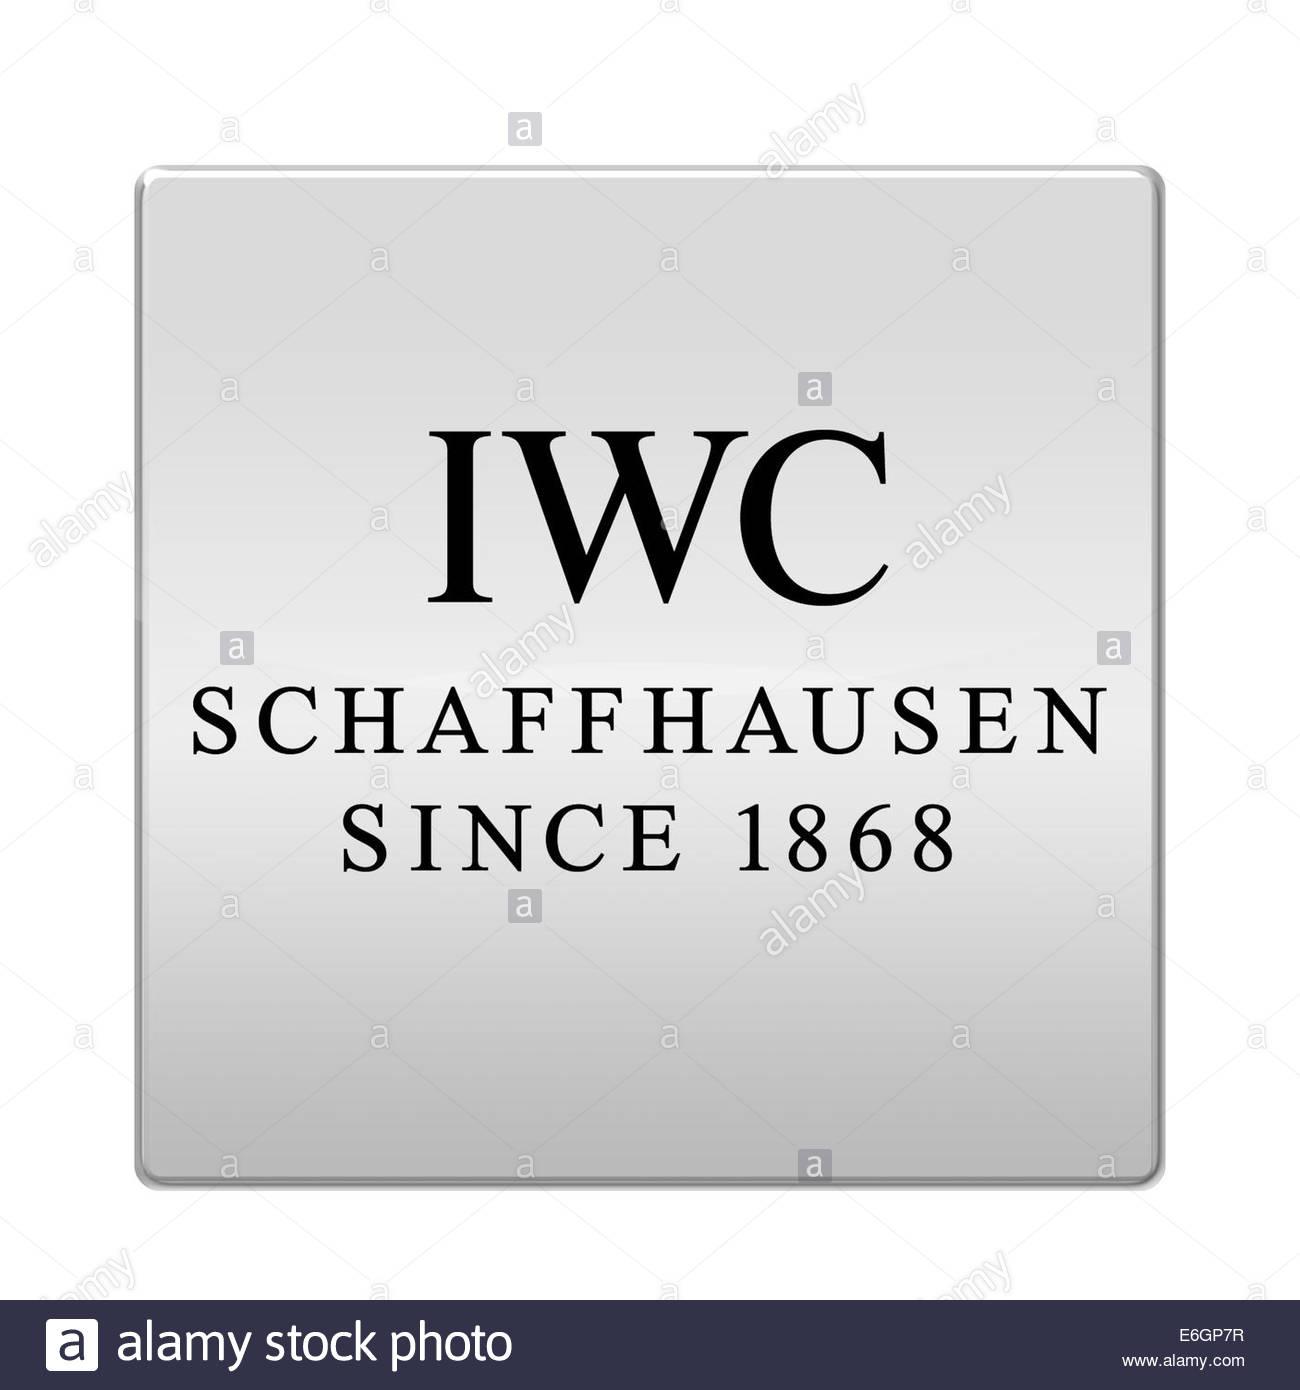 International Watch Company IWC icona logo isolato pulsante app Immagini Stock